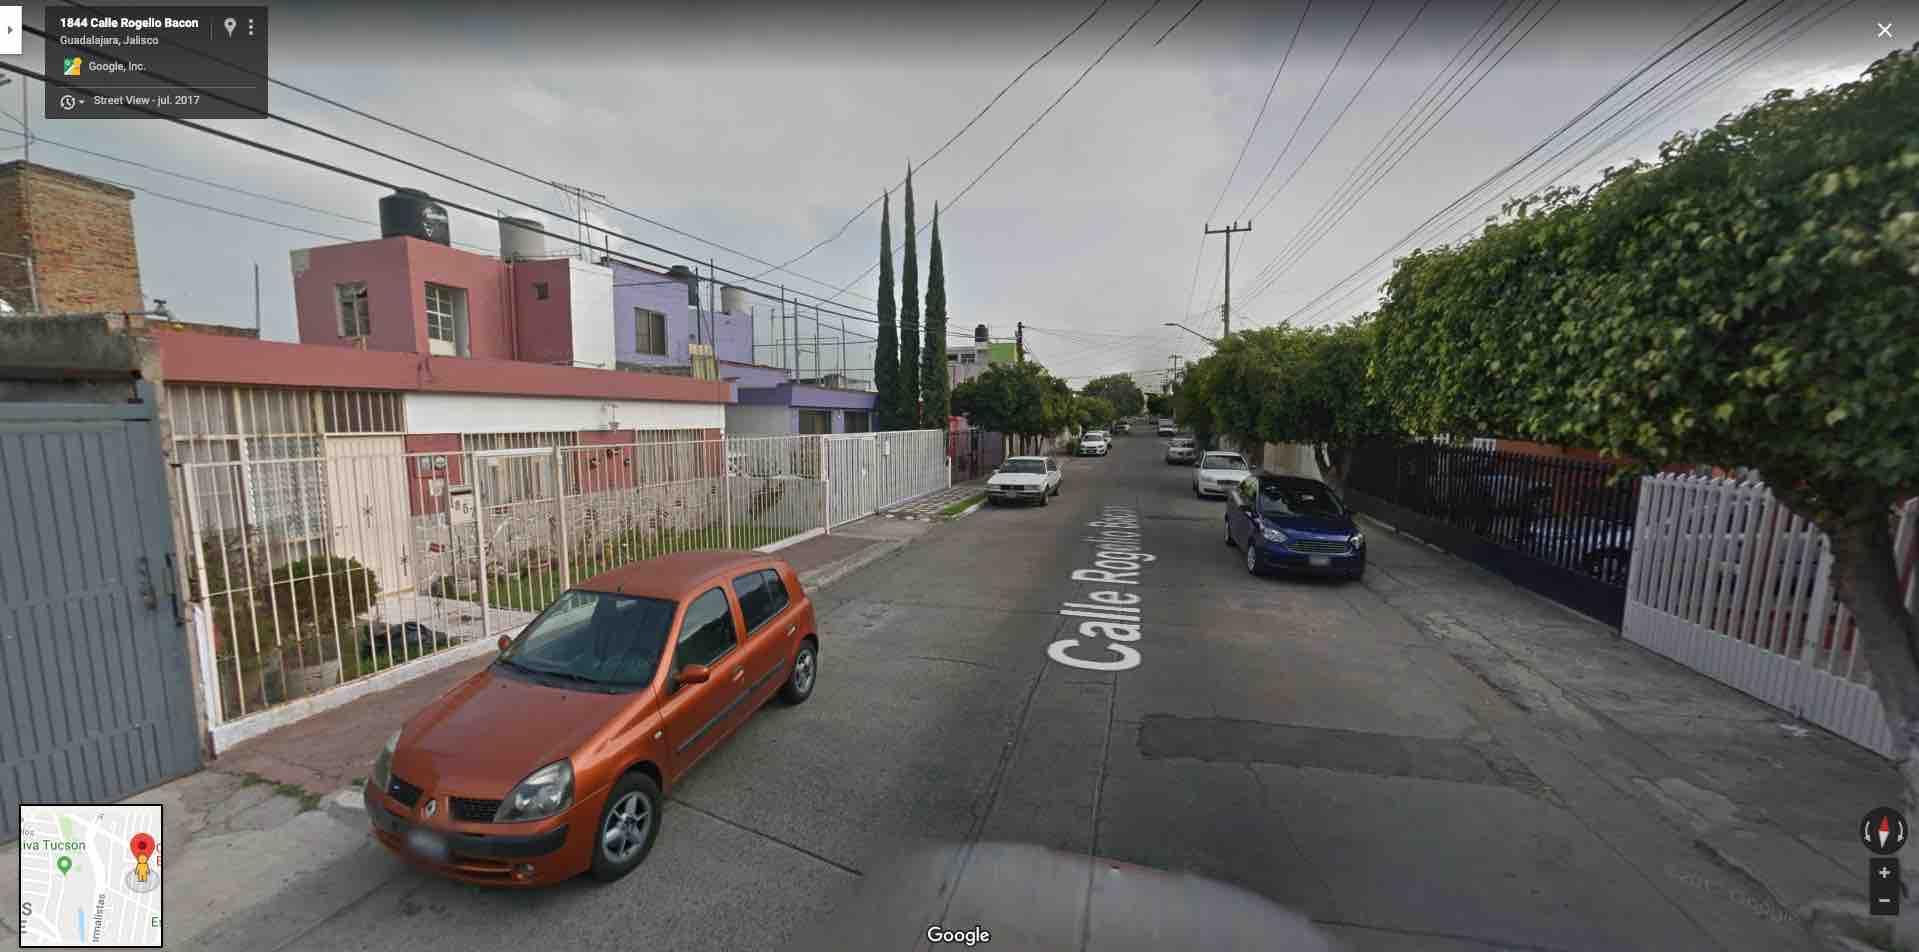 Colonia Independencia, Calle Rogelio Bacon 1863, Guadalajara, Jal. C.P. 44379